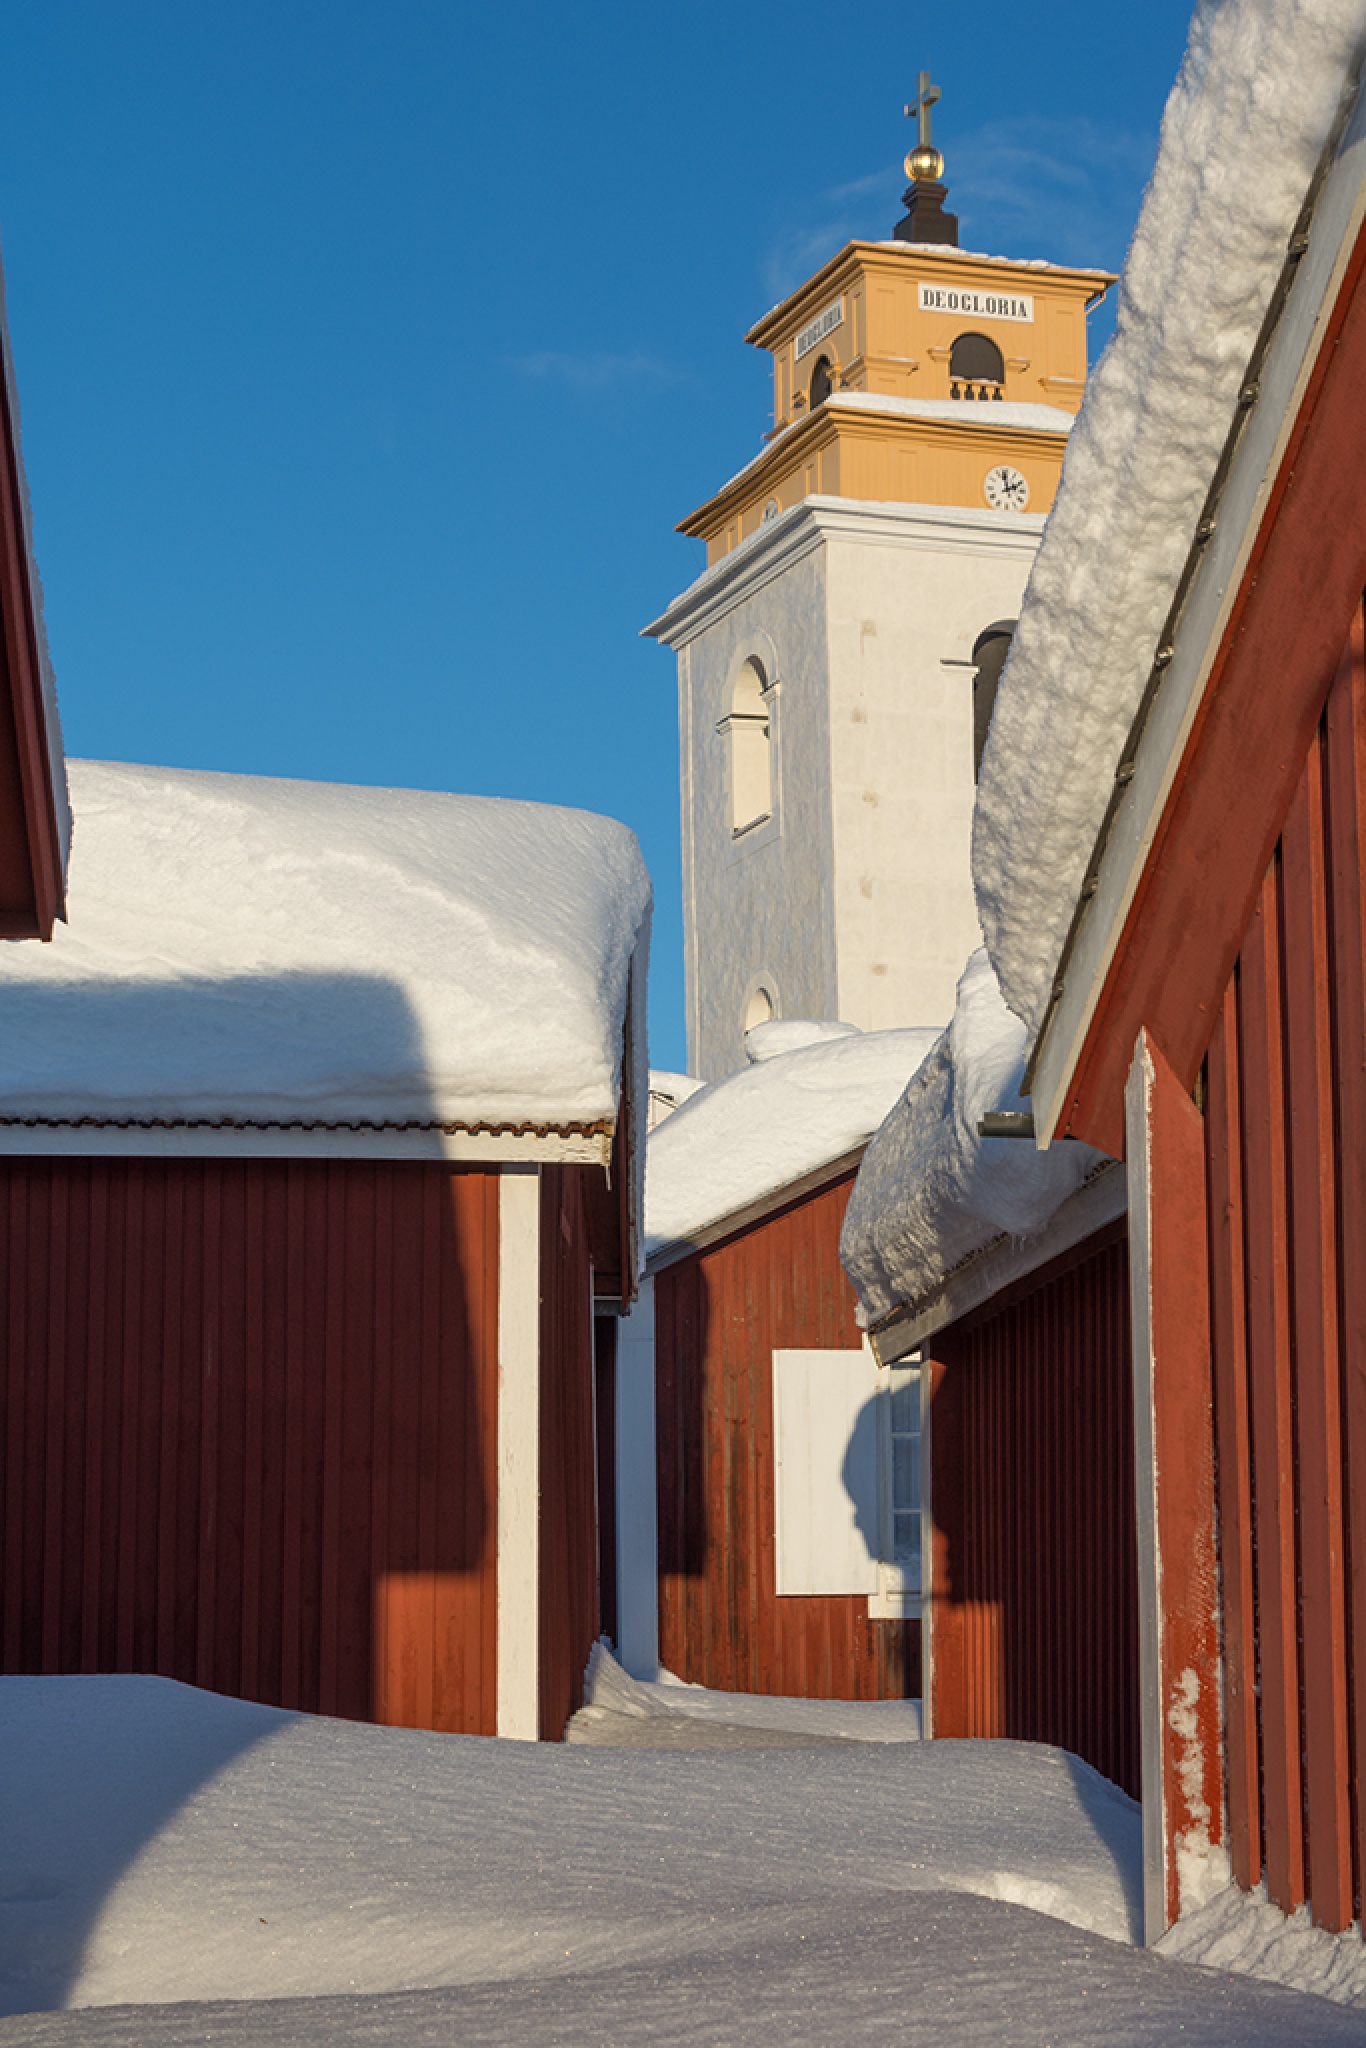 Churhtown in Gammelstad by MargaretaG